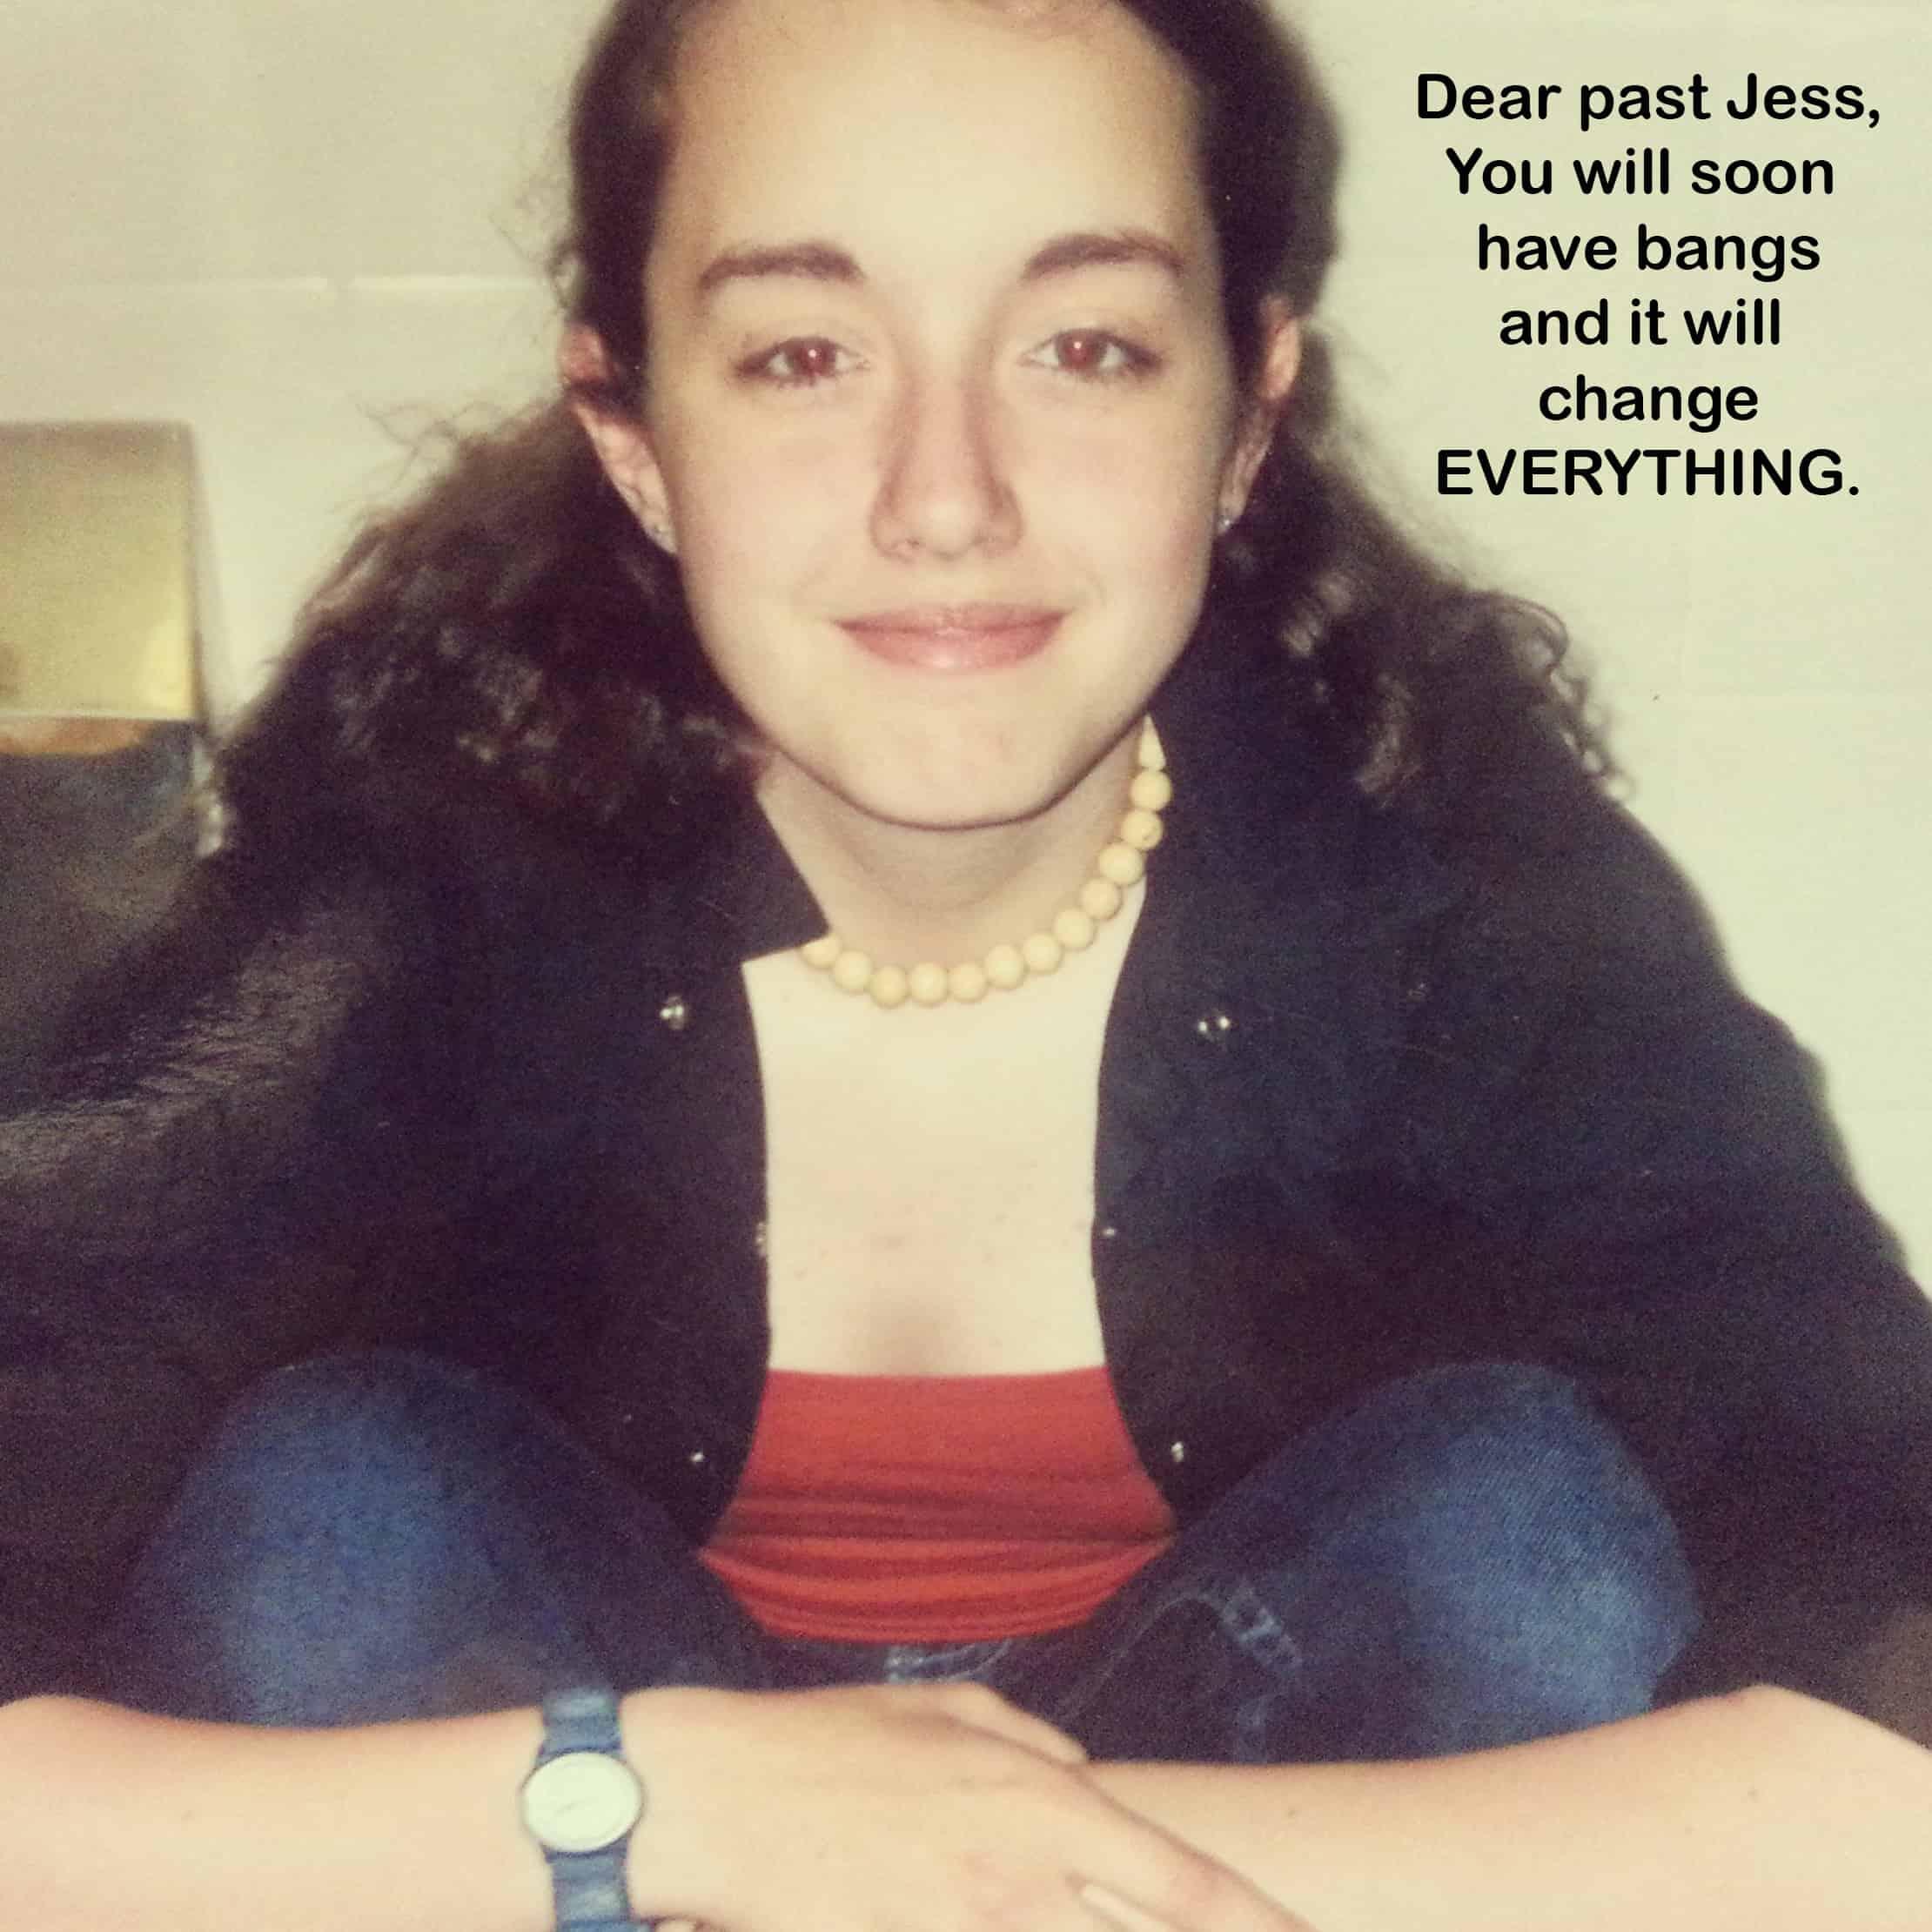 Past Jess